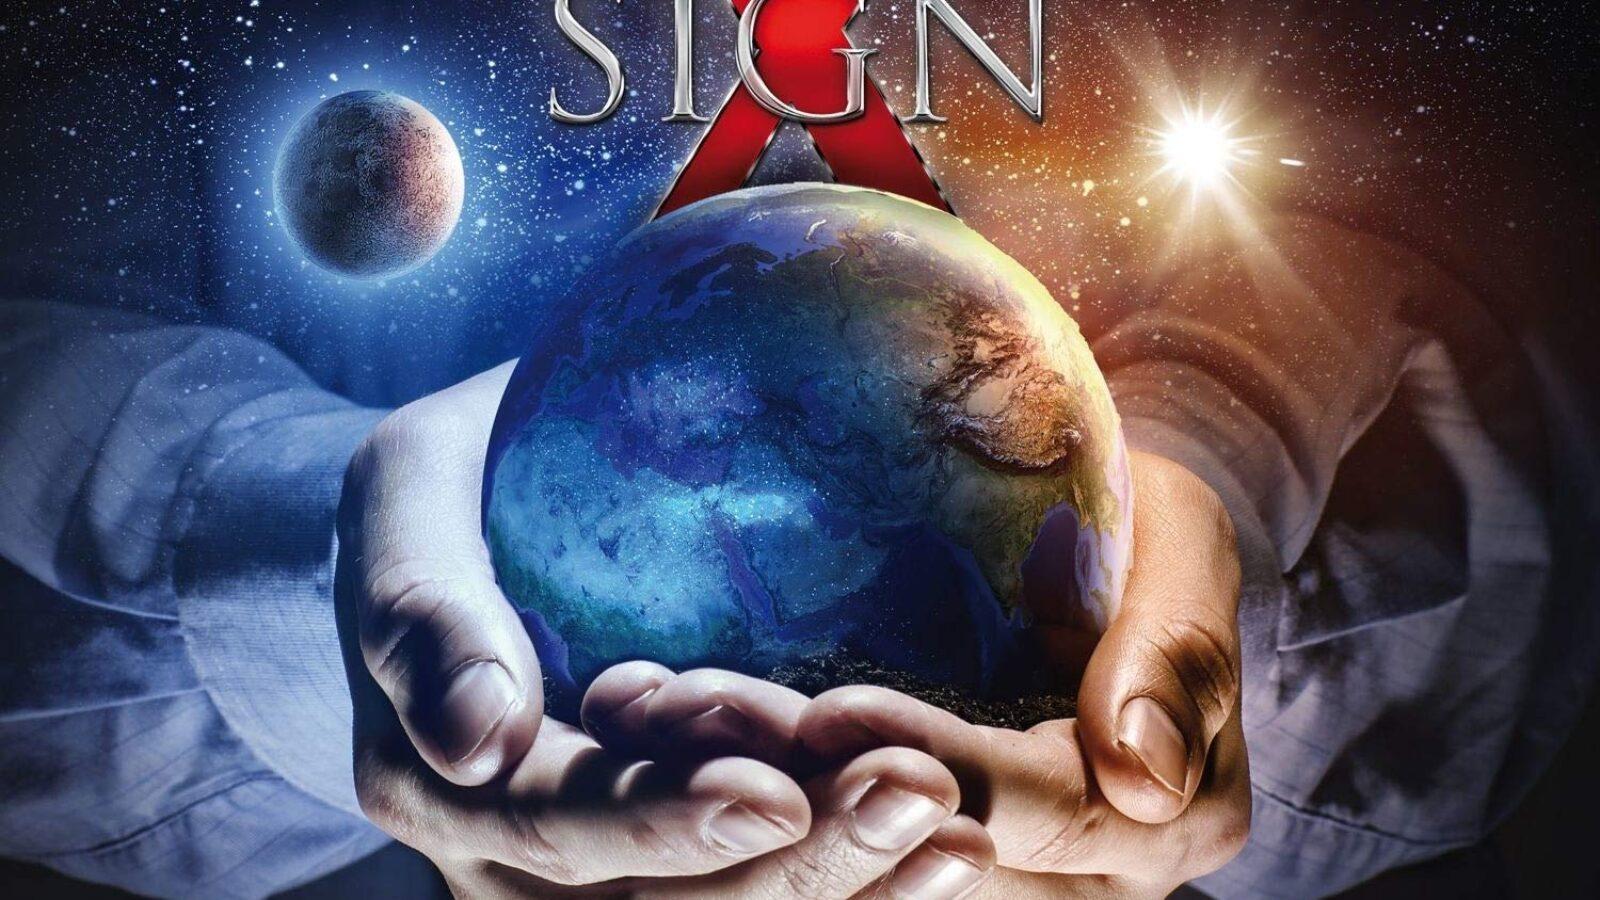 Sign X